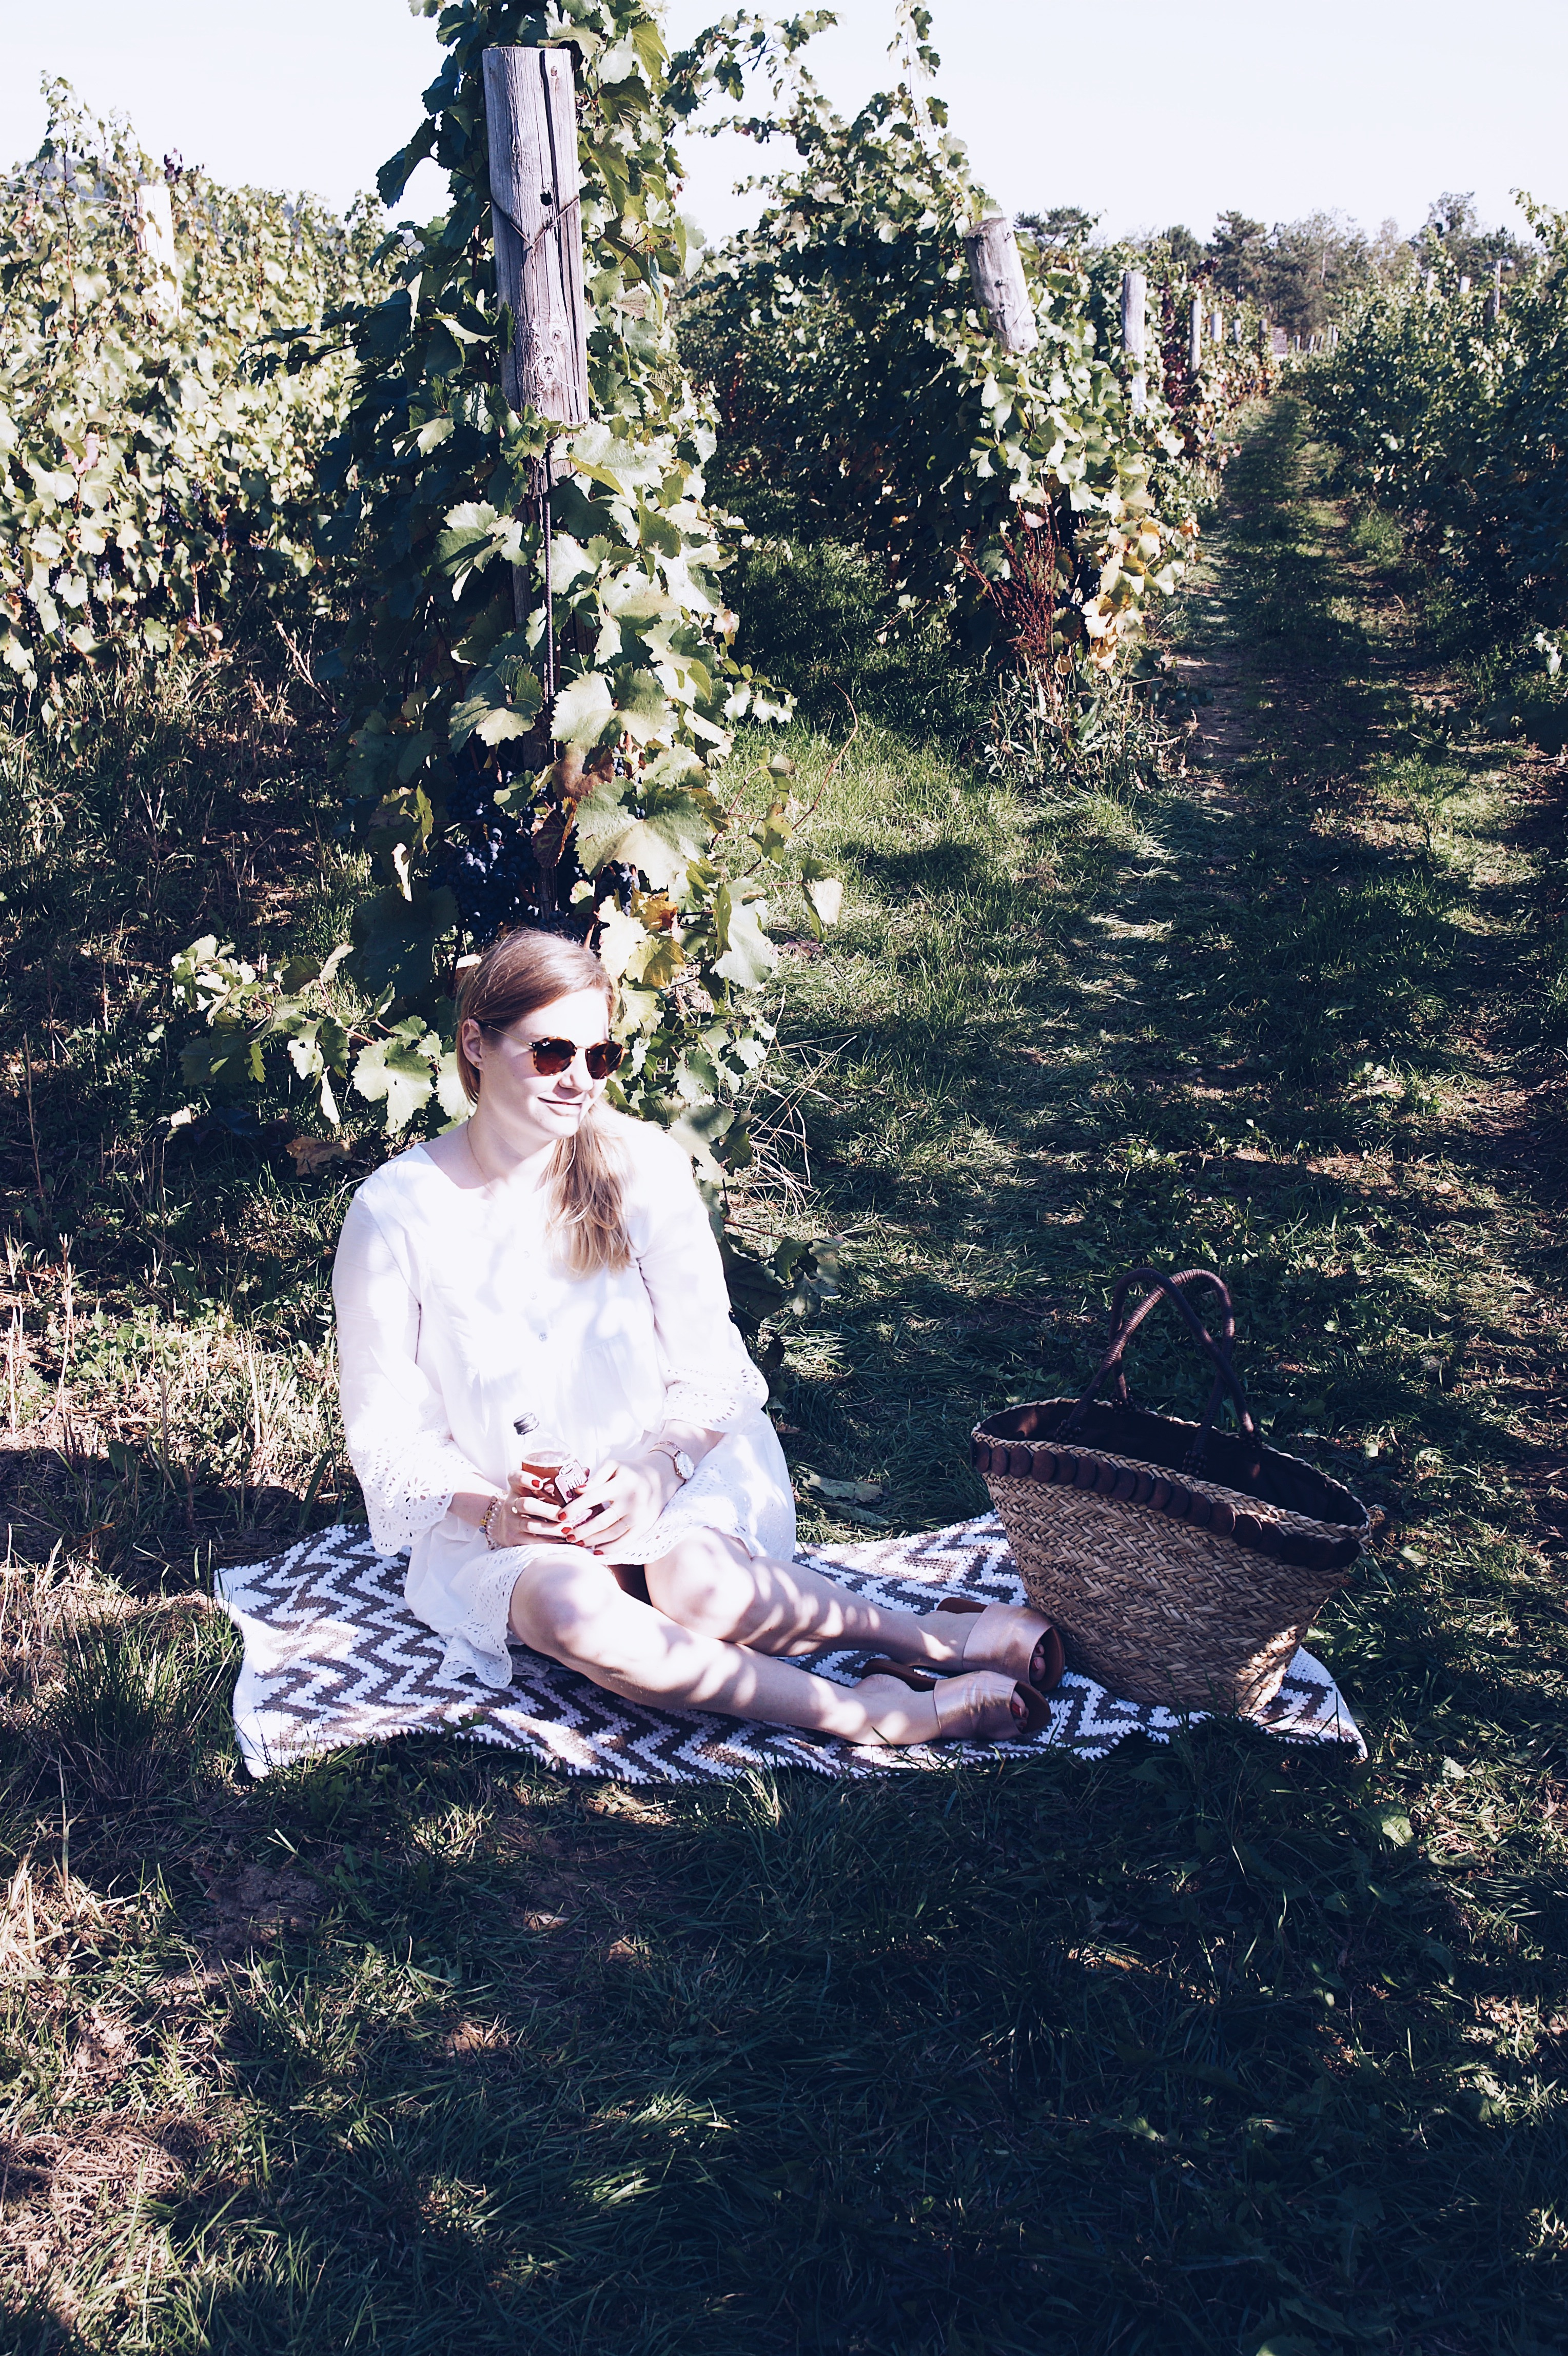 Weinlese, Picknick